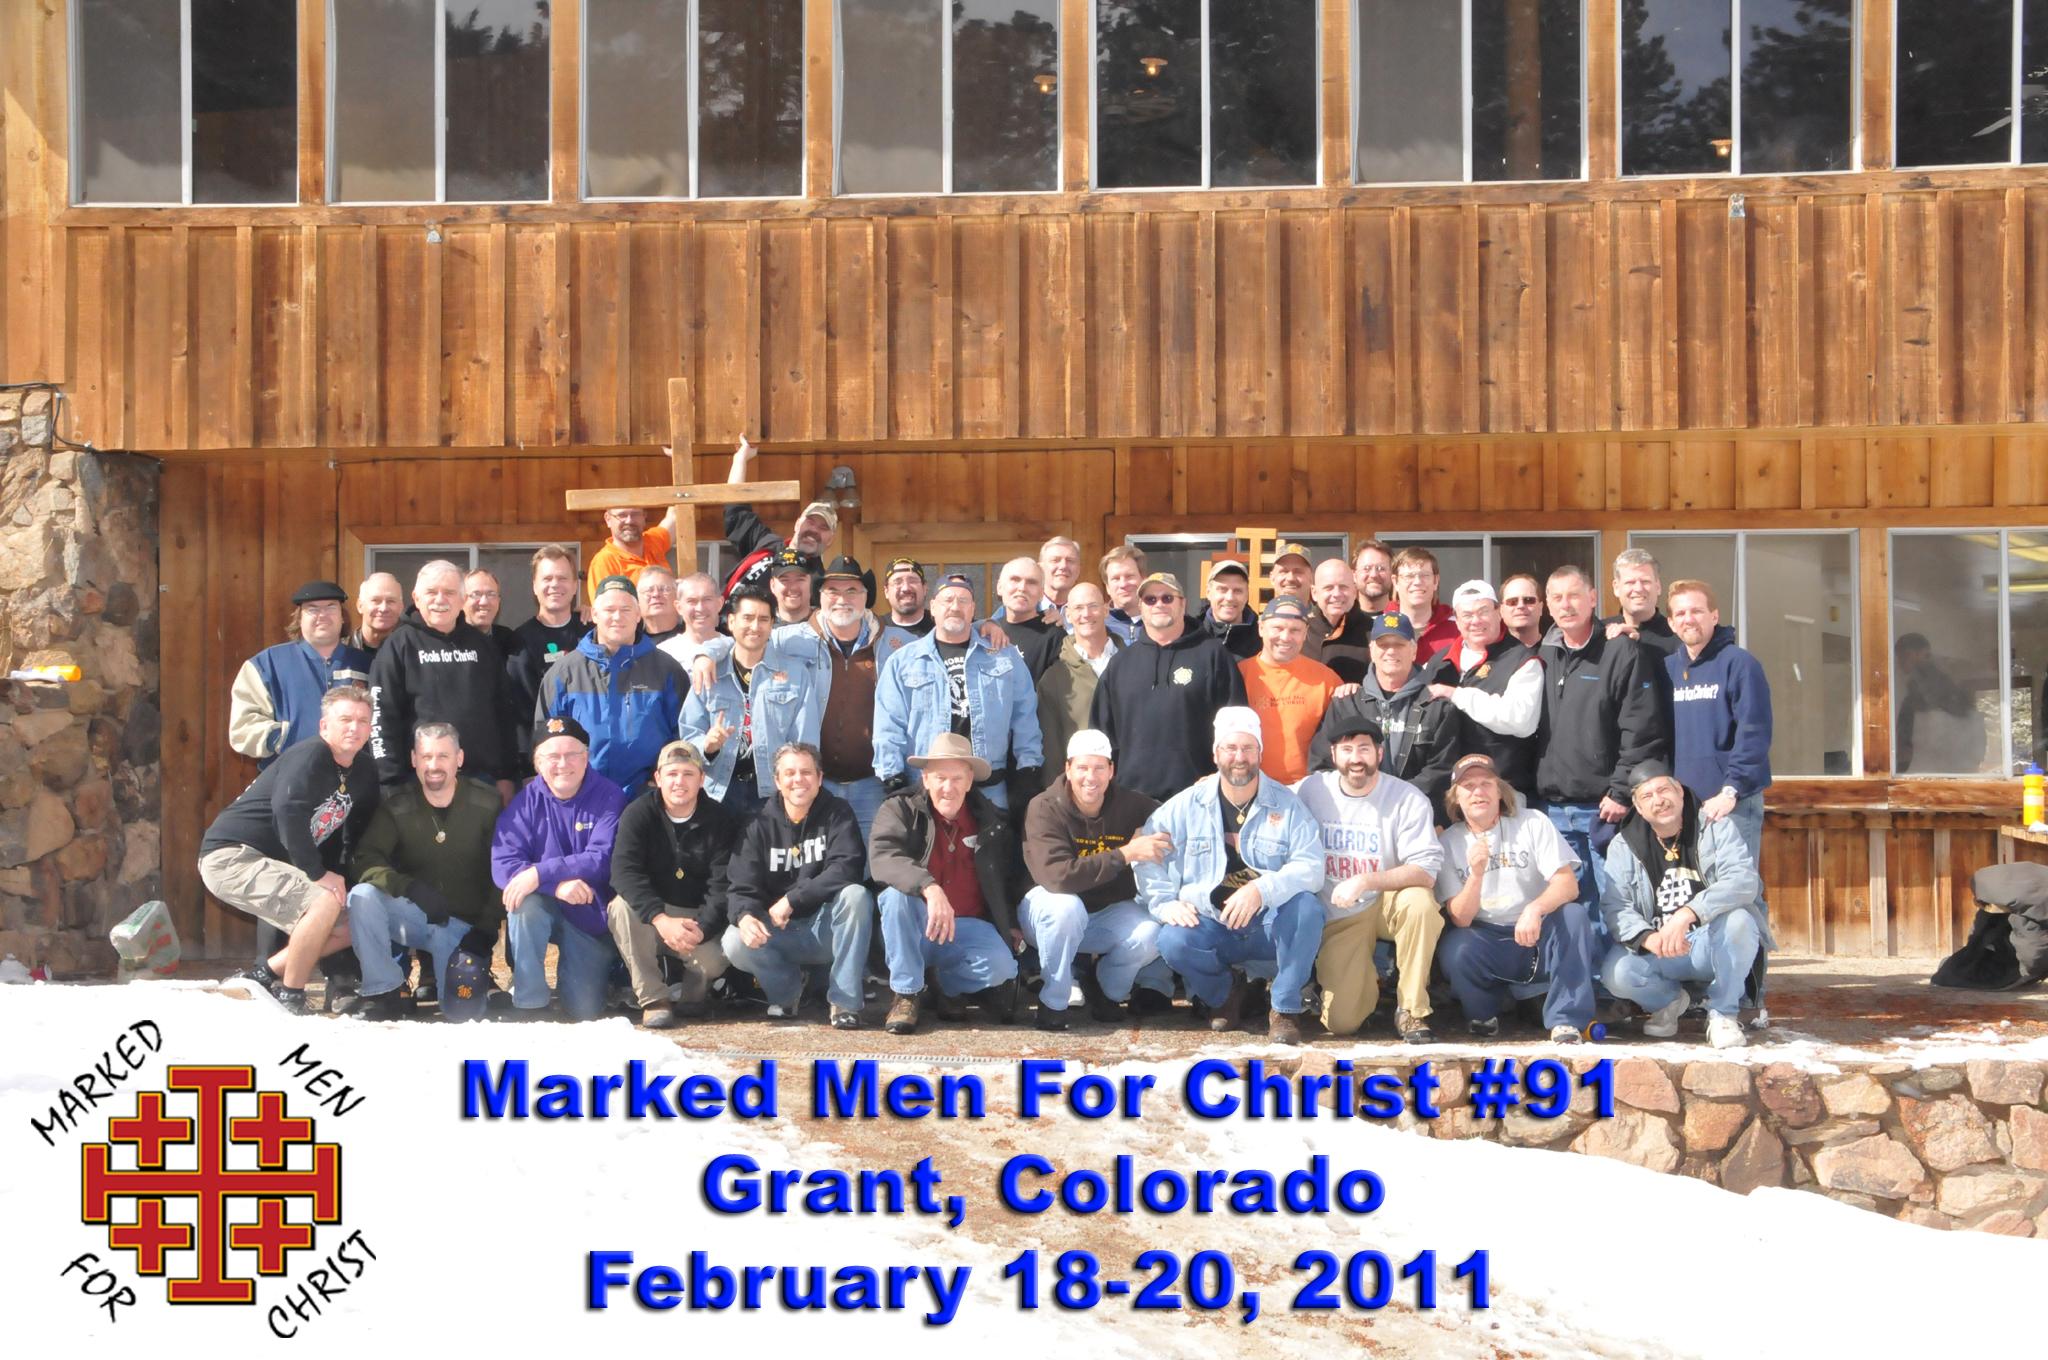 2011-02-FEB-CO-Staff.0ad3804d-cc64-4424-a36b-873987c3c220